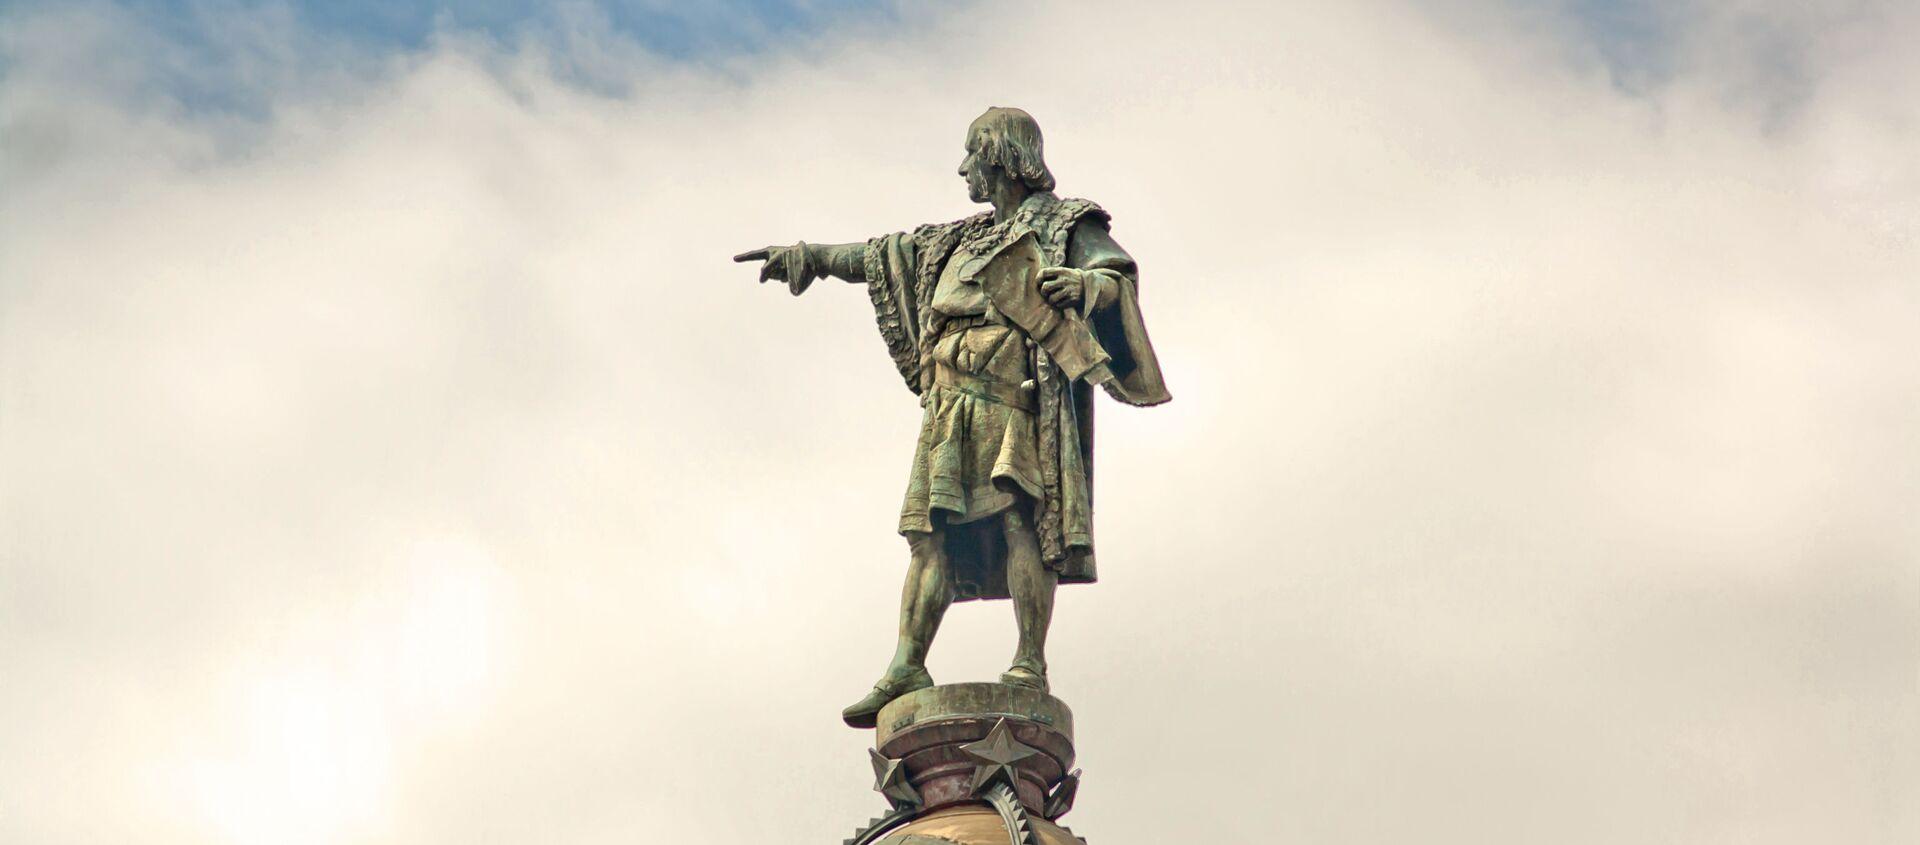 El monumento de Cristóbal Colón en Barcelona, España - Sputnik Mundo, 1920, 20.12.2018